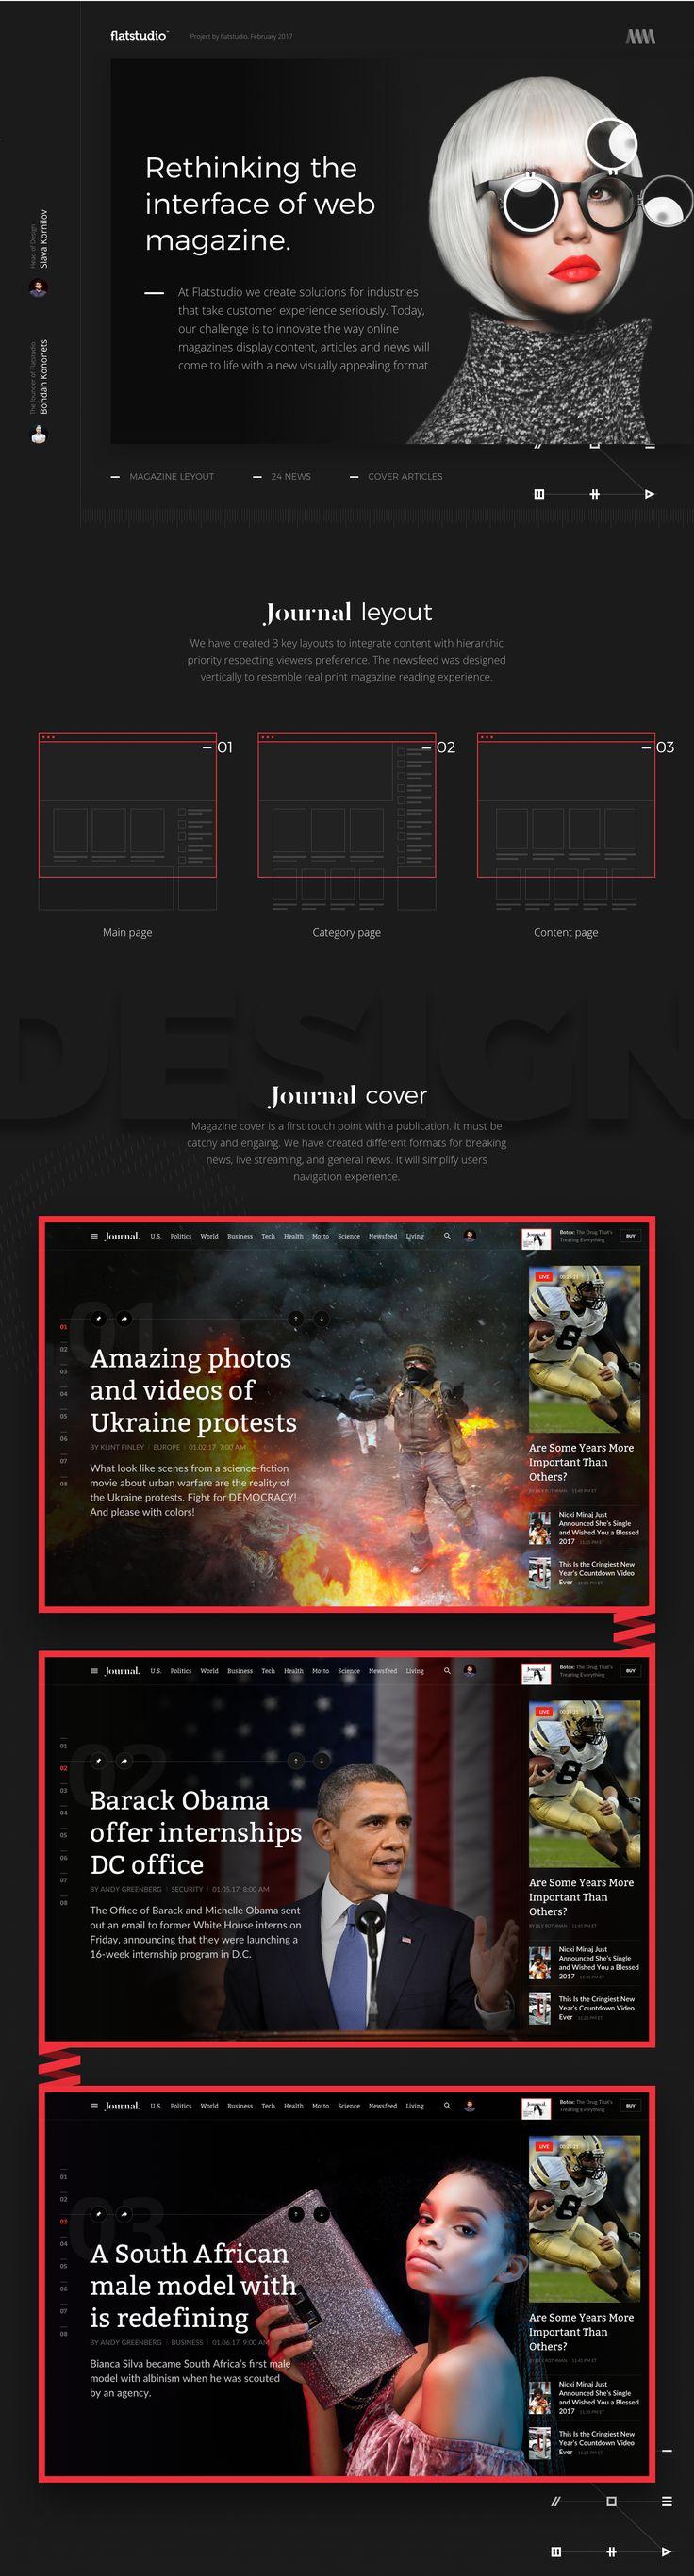 Ux solutions digital art director and motion designer based in noosa - Web Design The Journal Concept Ui Ux